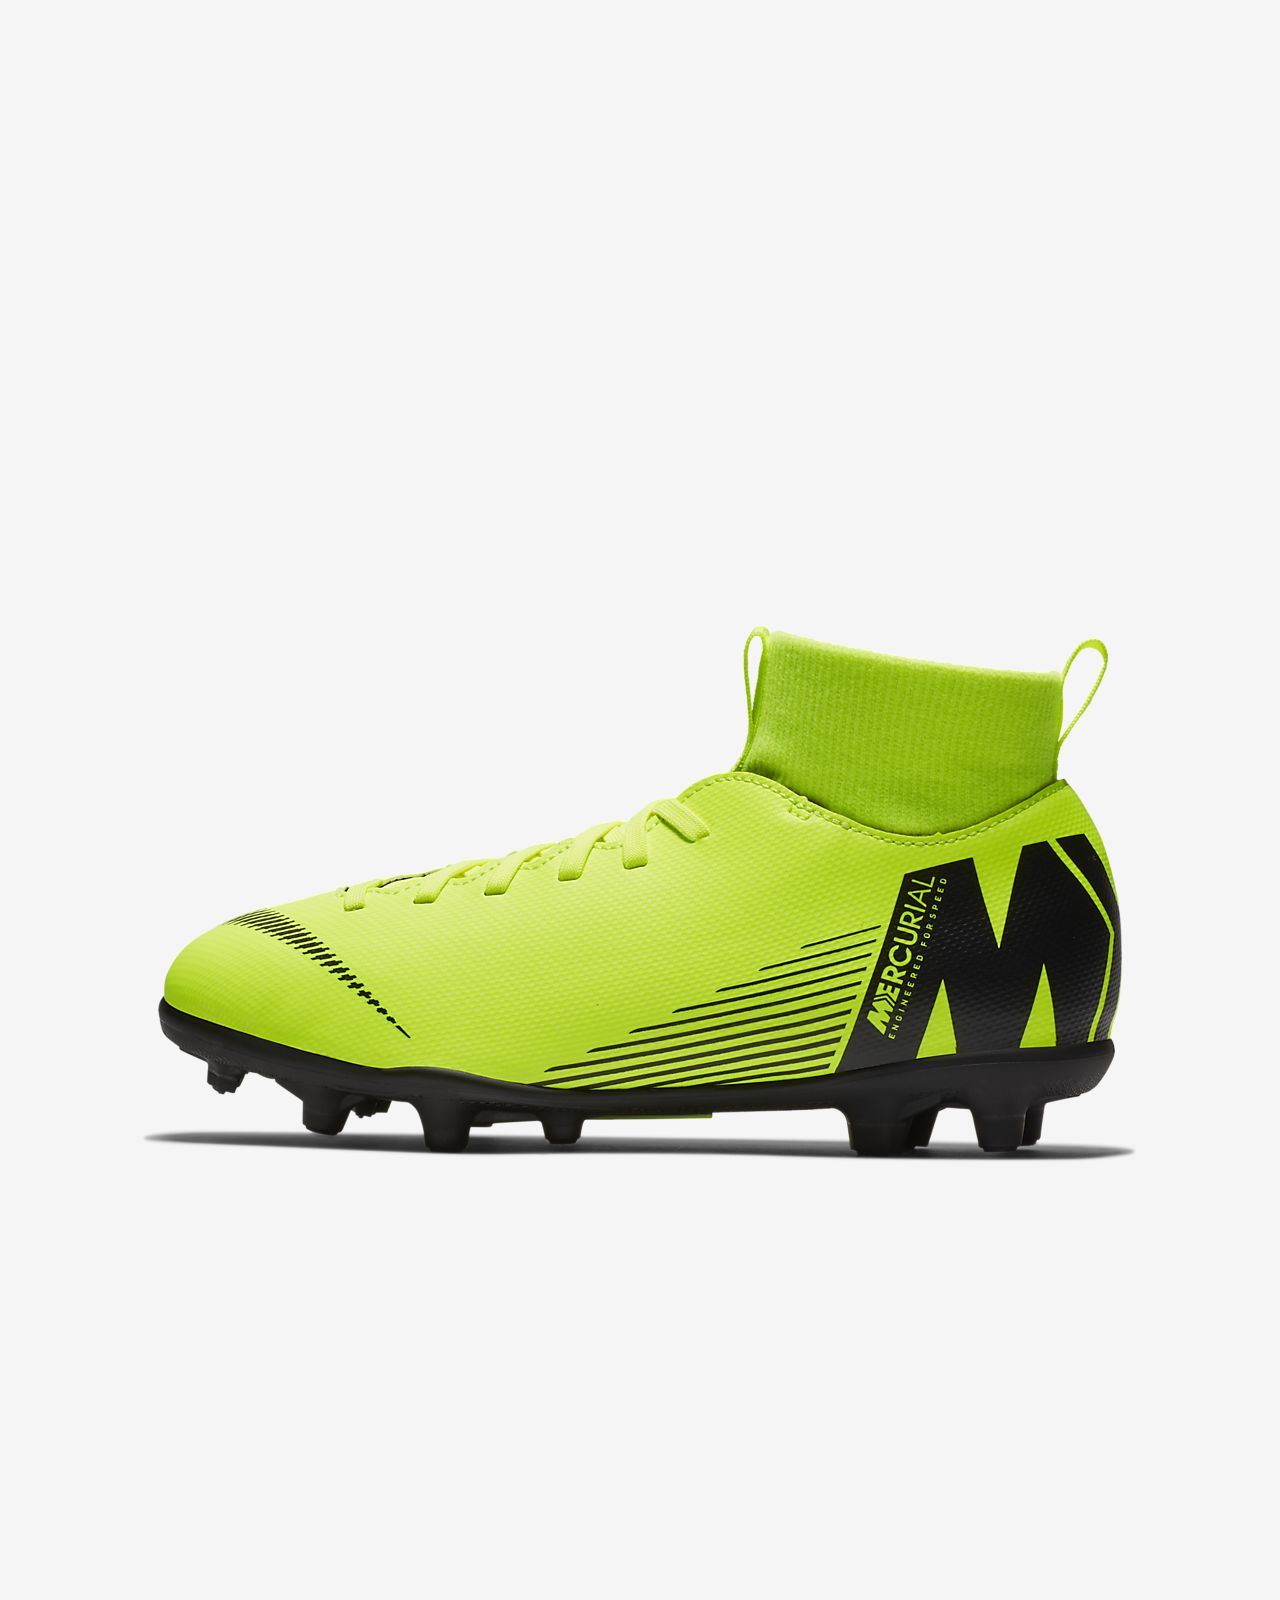 Nike Jr. Mercurial Superfly VI Club Voetbalschoen voor kleuterskids (meerdere ondergronden)